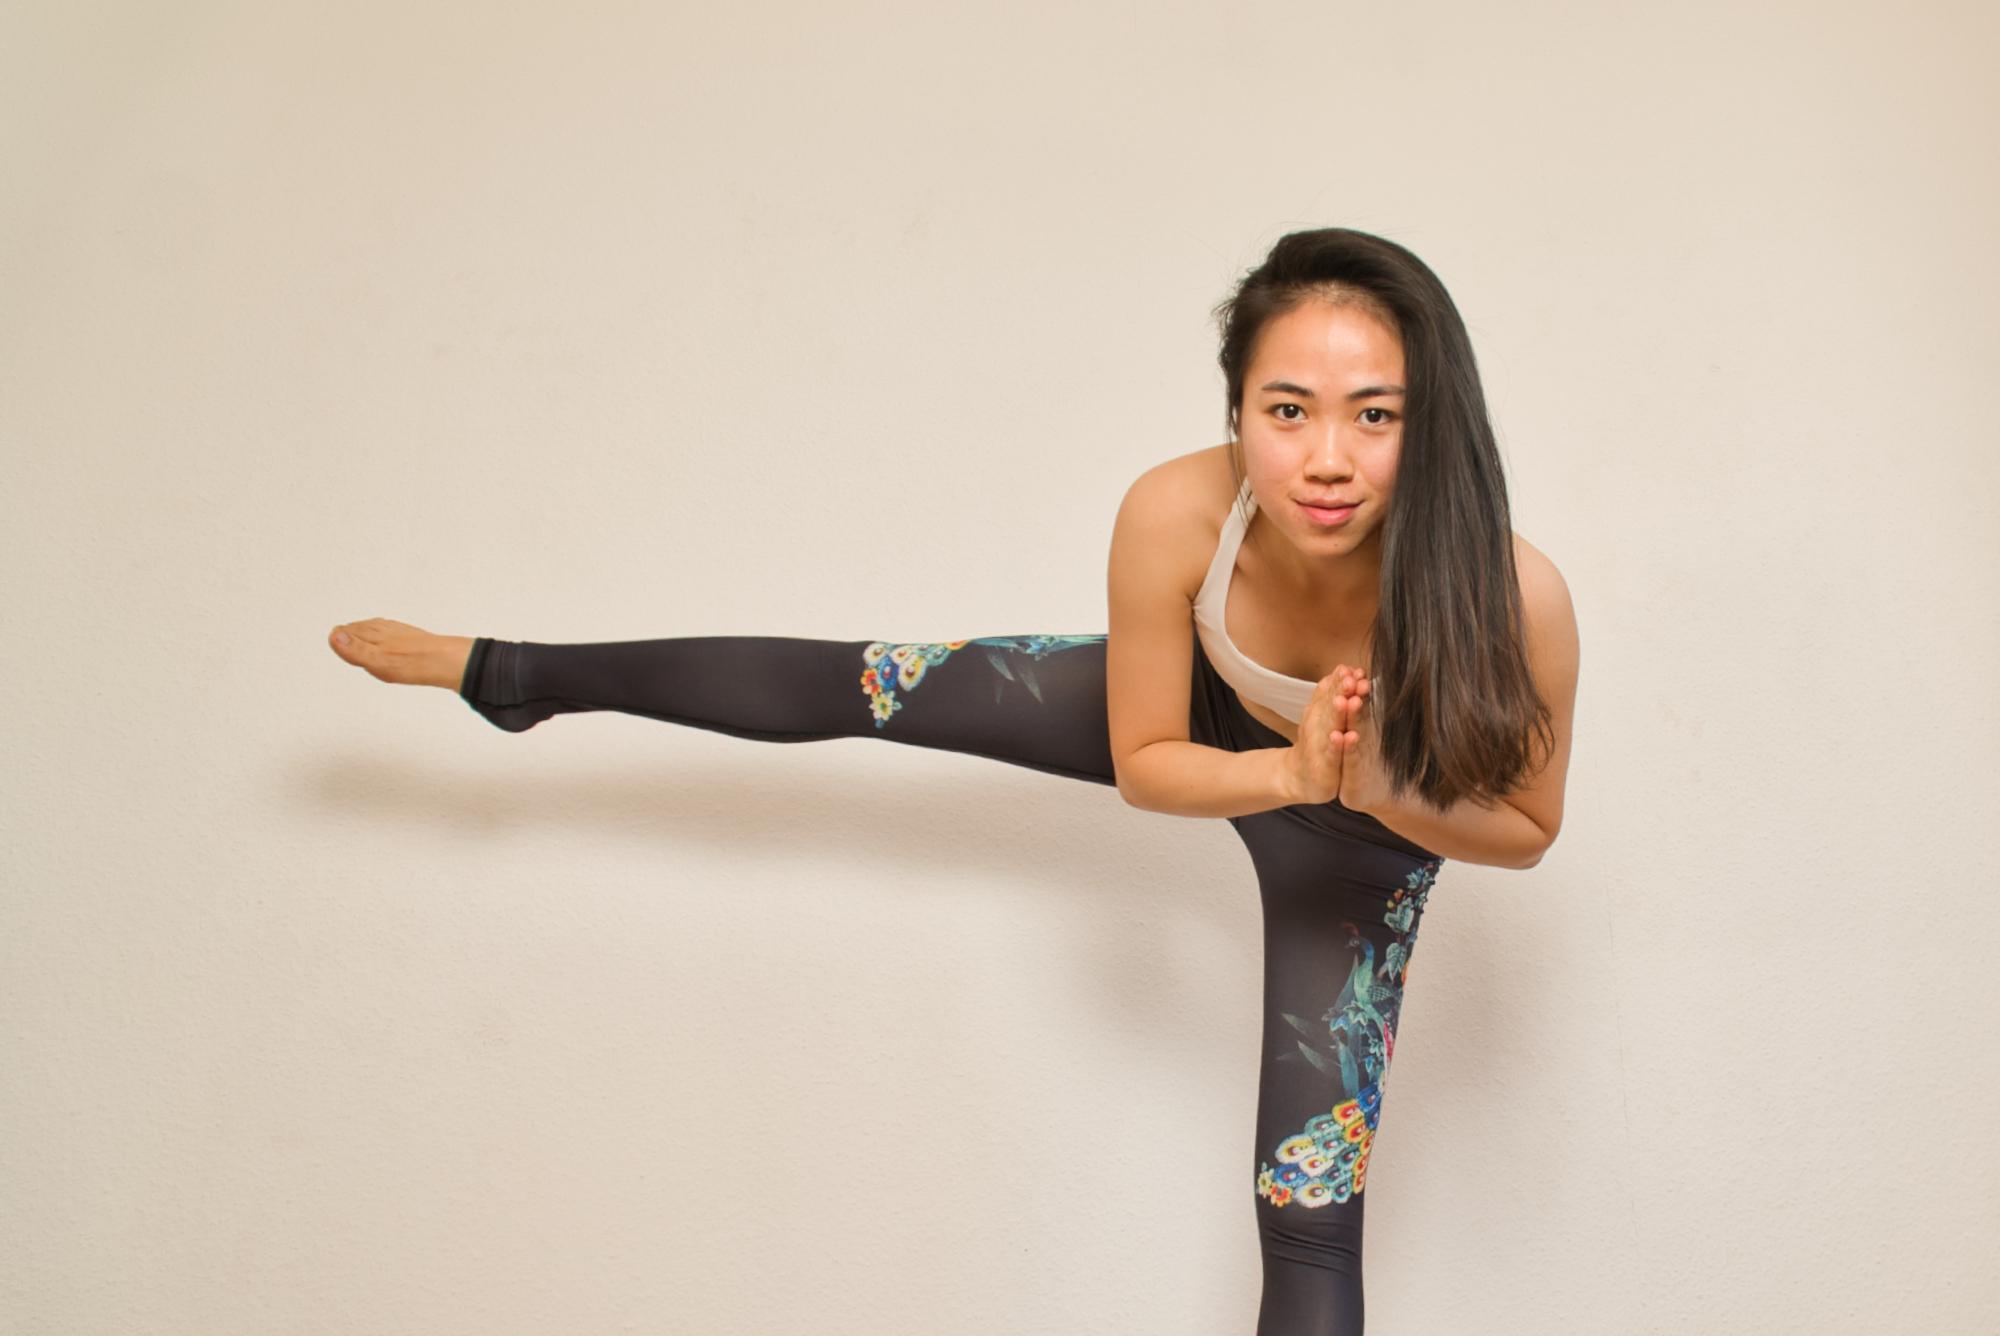 Gemma Portrait Yoga Demonstration 3